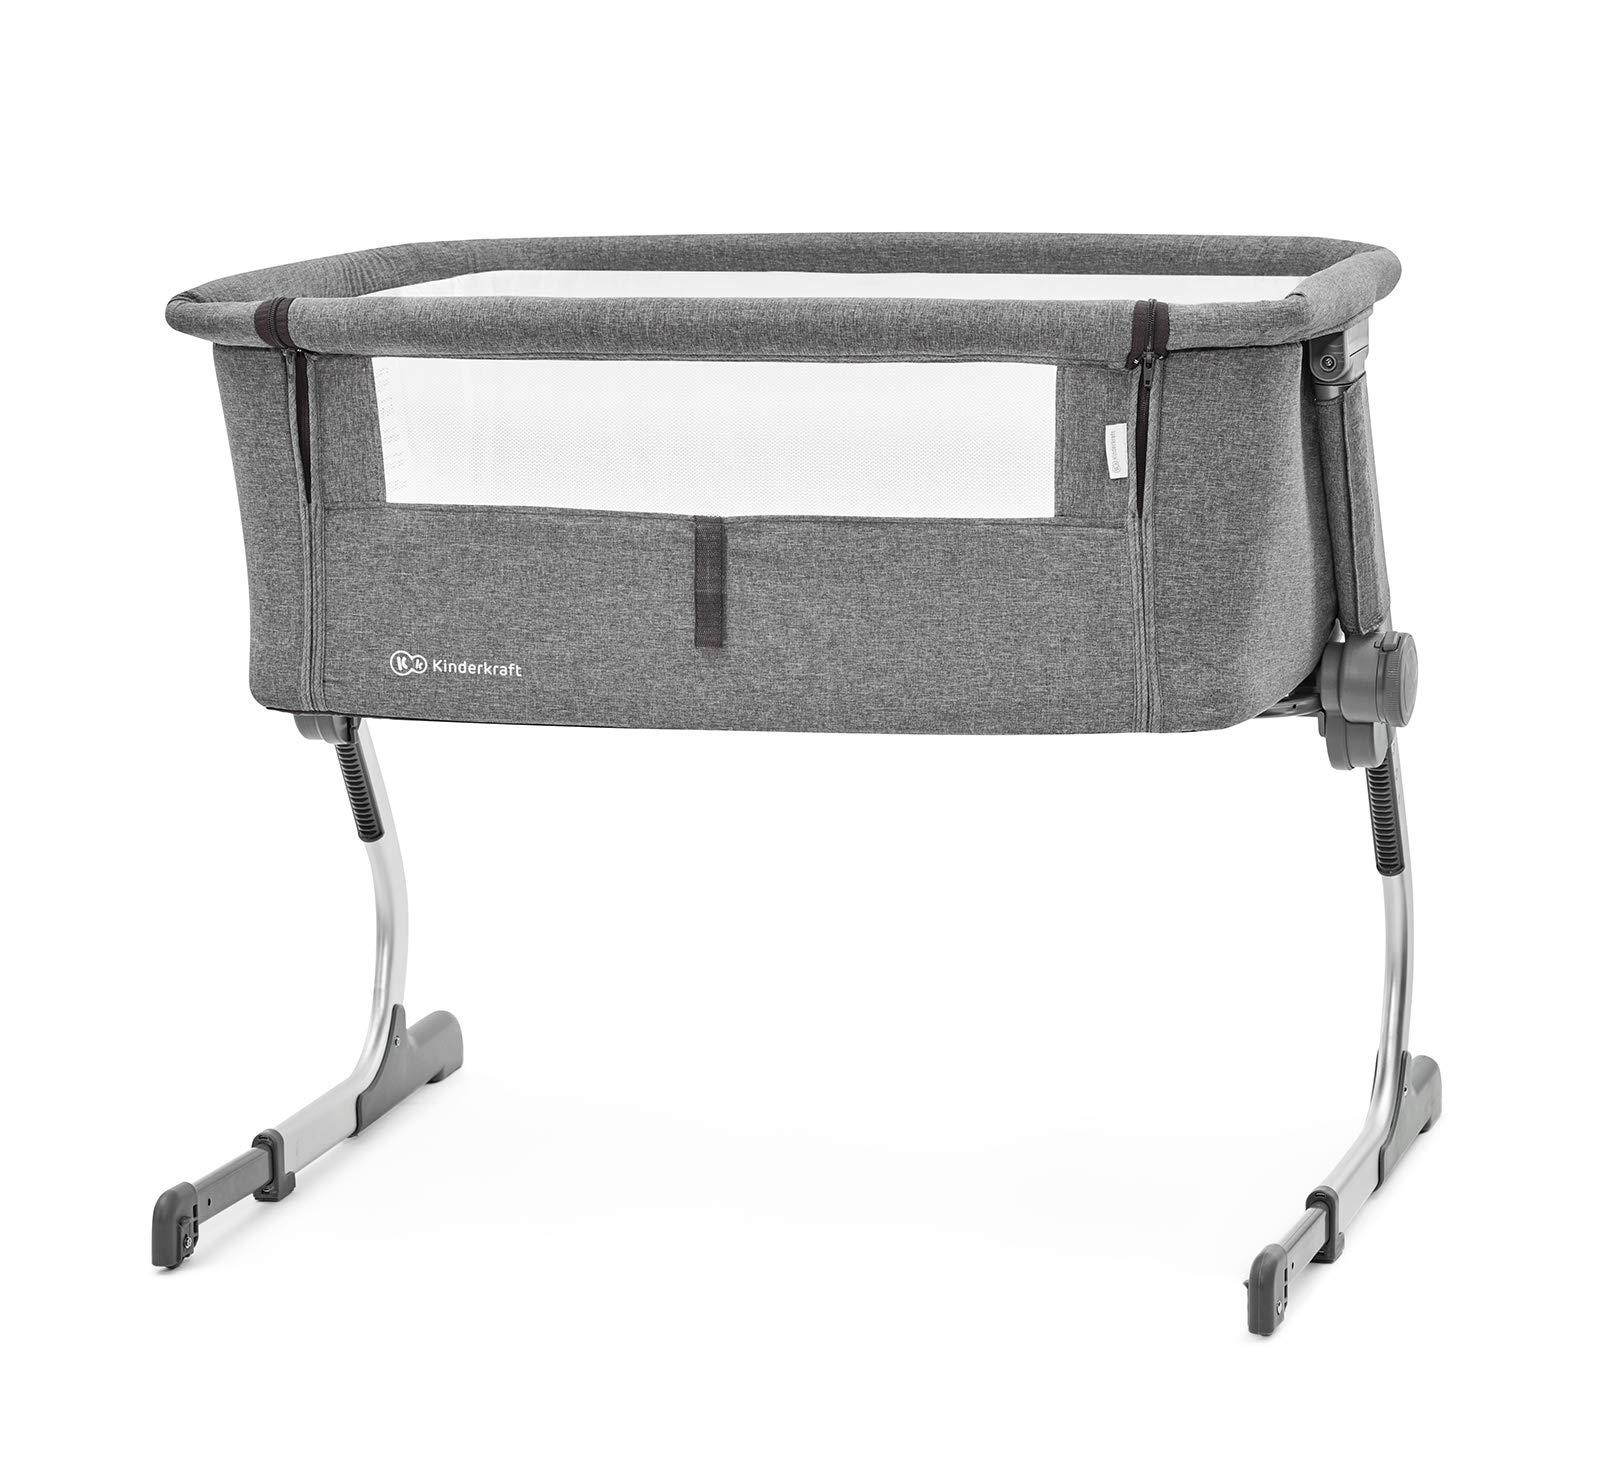 kk Kinderkraft Bedside Cot UNO 2in1 Crib Travel Cot Co-Sleeping Bed Aluminum Folded Wheels Height NAD Slope Adjustable for Newborn Toddler with Accessories Bag Matttress Safety Certificate En 1130